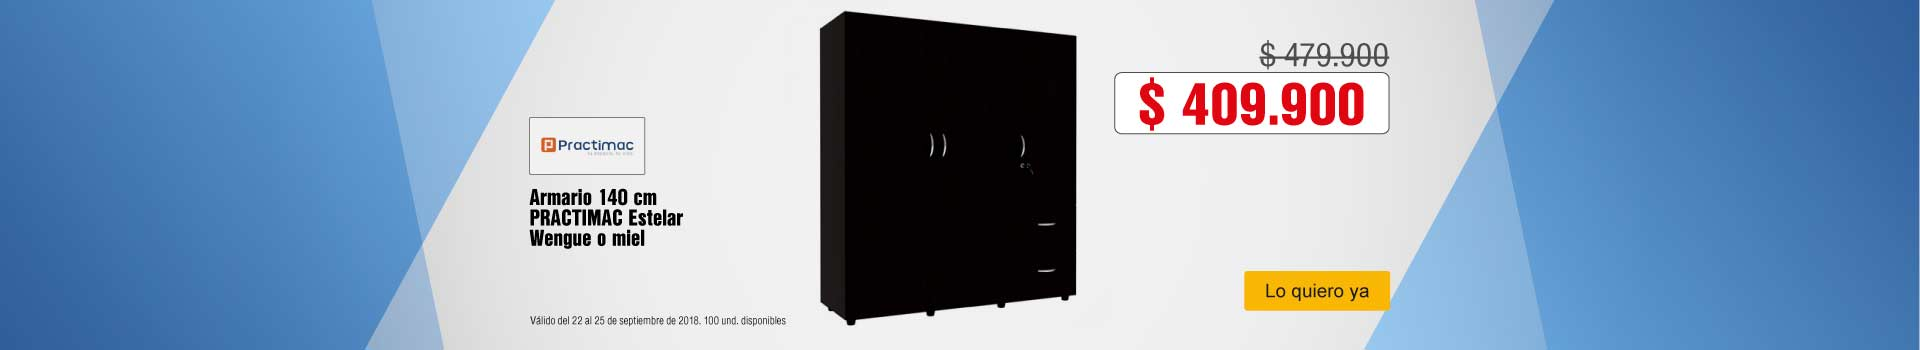 AK-BCAT-2-muebles-PP---practimac-armario-estelar-22sep